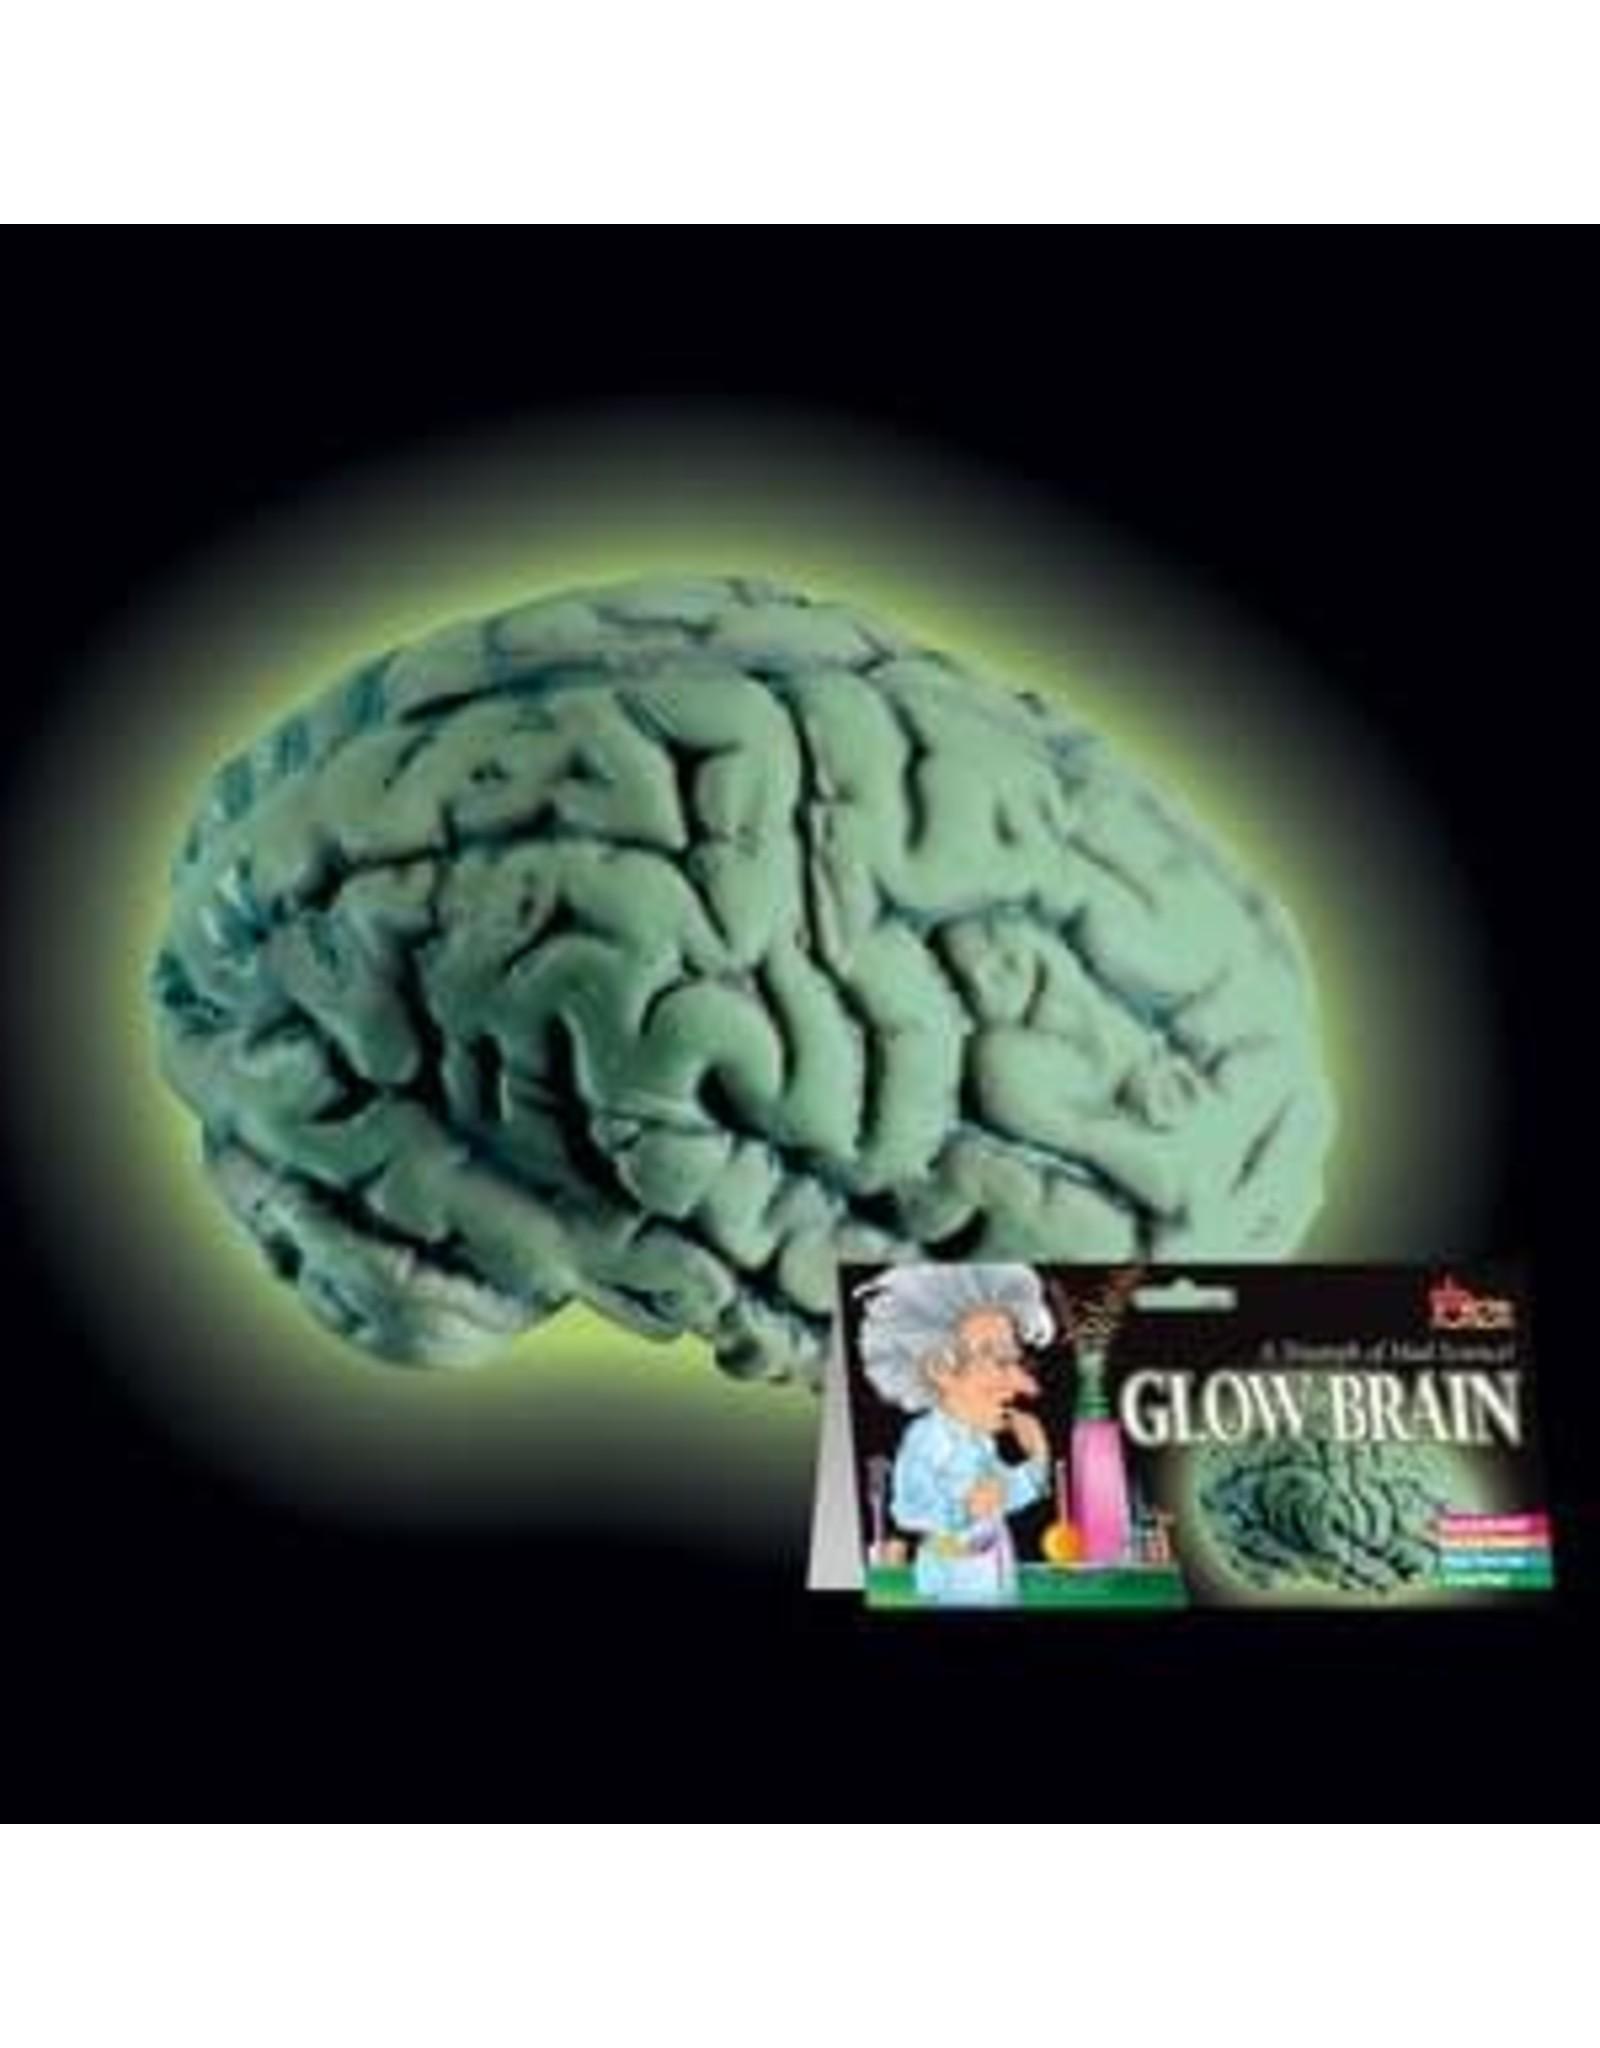 Loftus Glow Brain